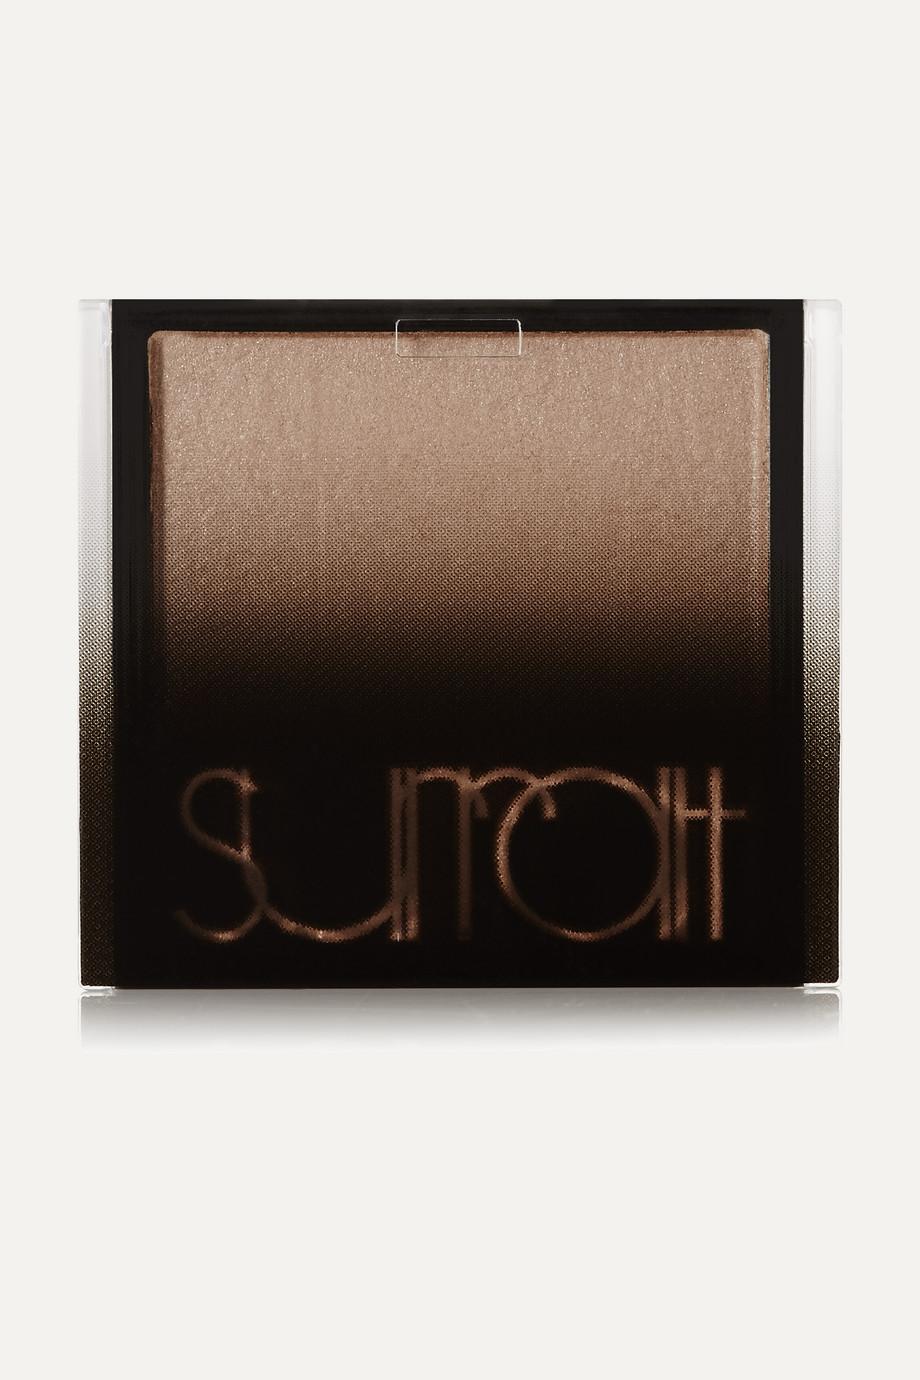 Surratt Beauty Artistique Eyeshadow - 9 Ombré